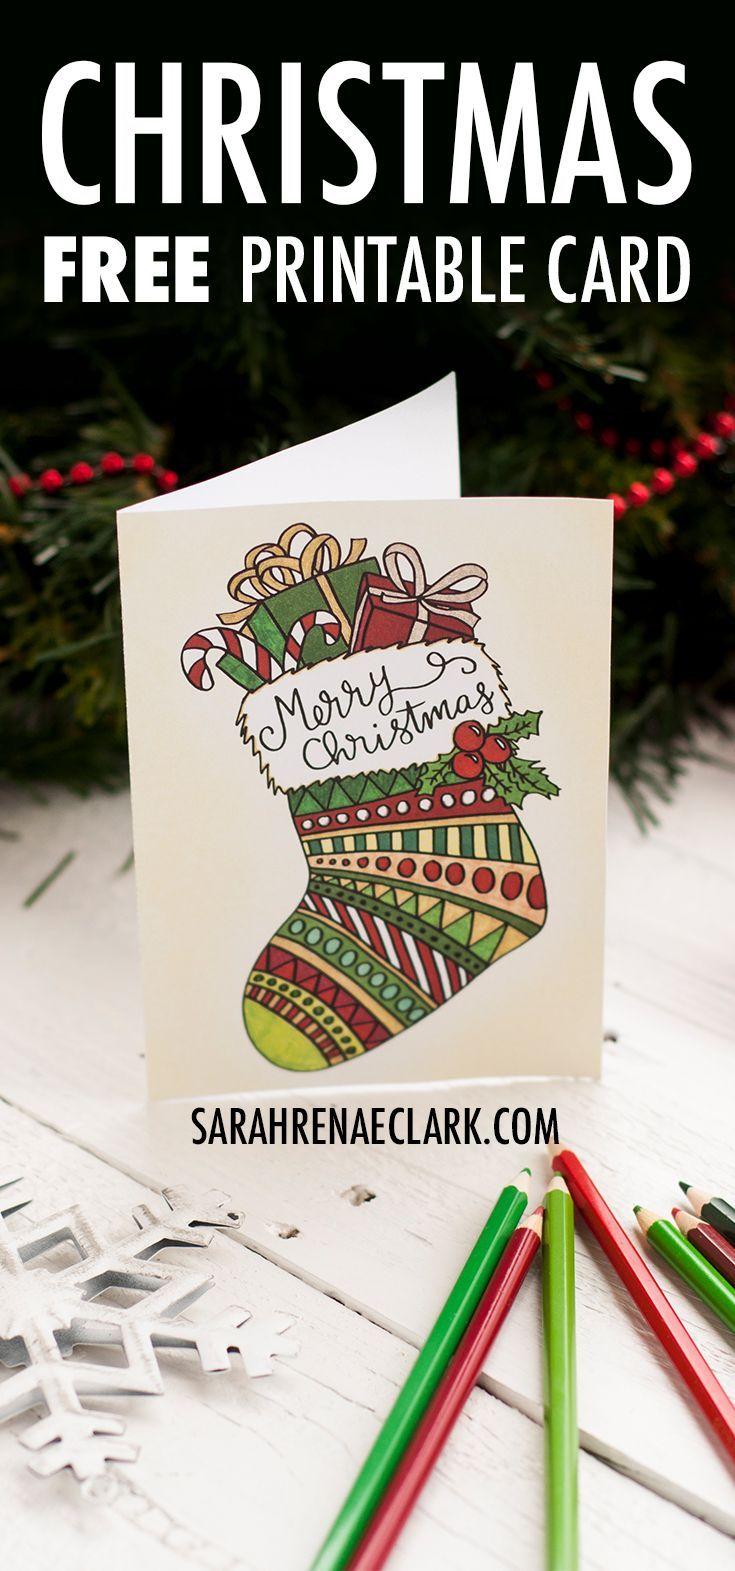 Free Christmas Card Printable Template Coloring Page Christmas Card Free Printable Christmas Cards Christmas Coloring Cards Printable Christmas Cards